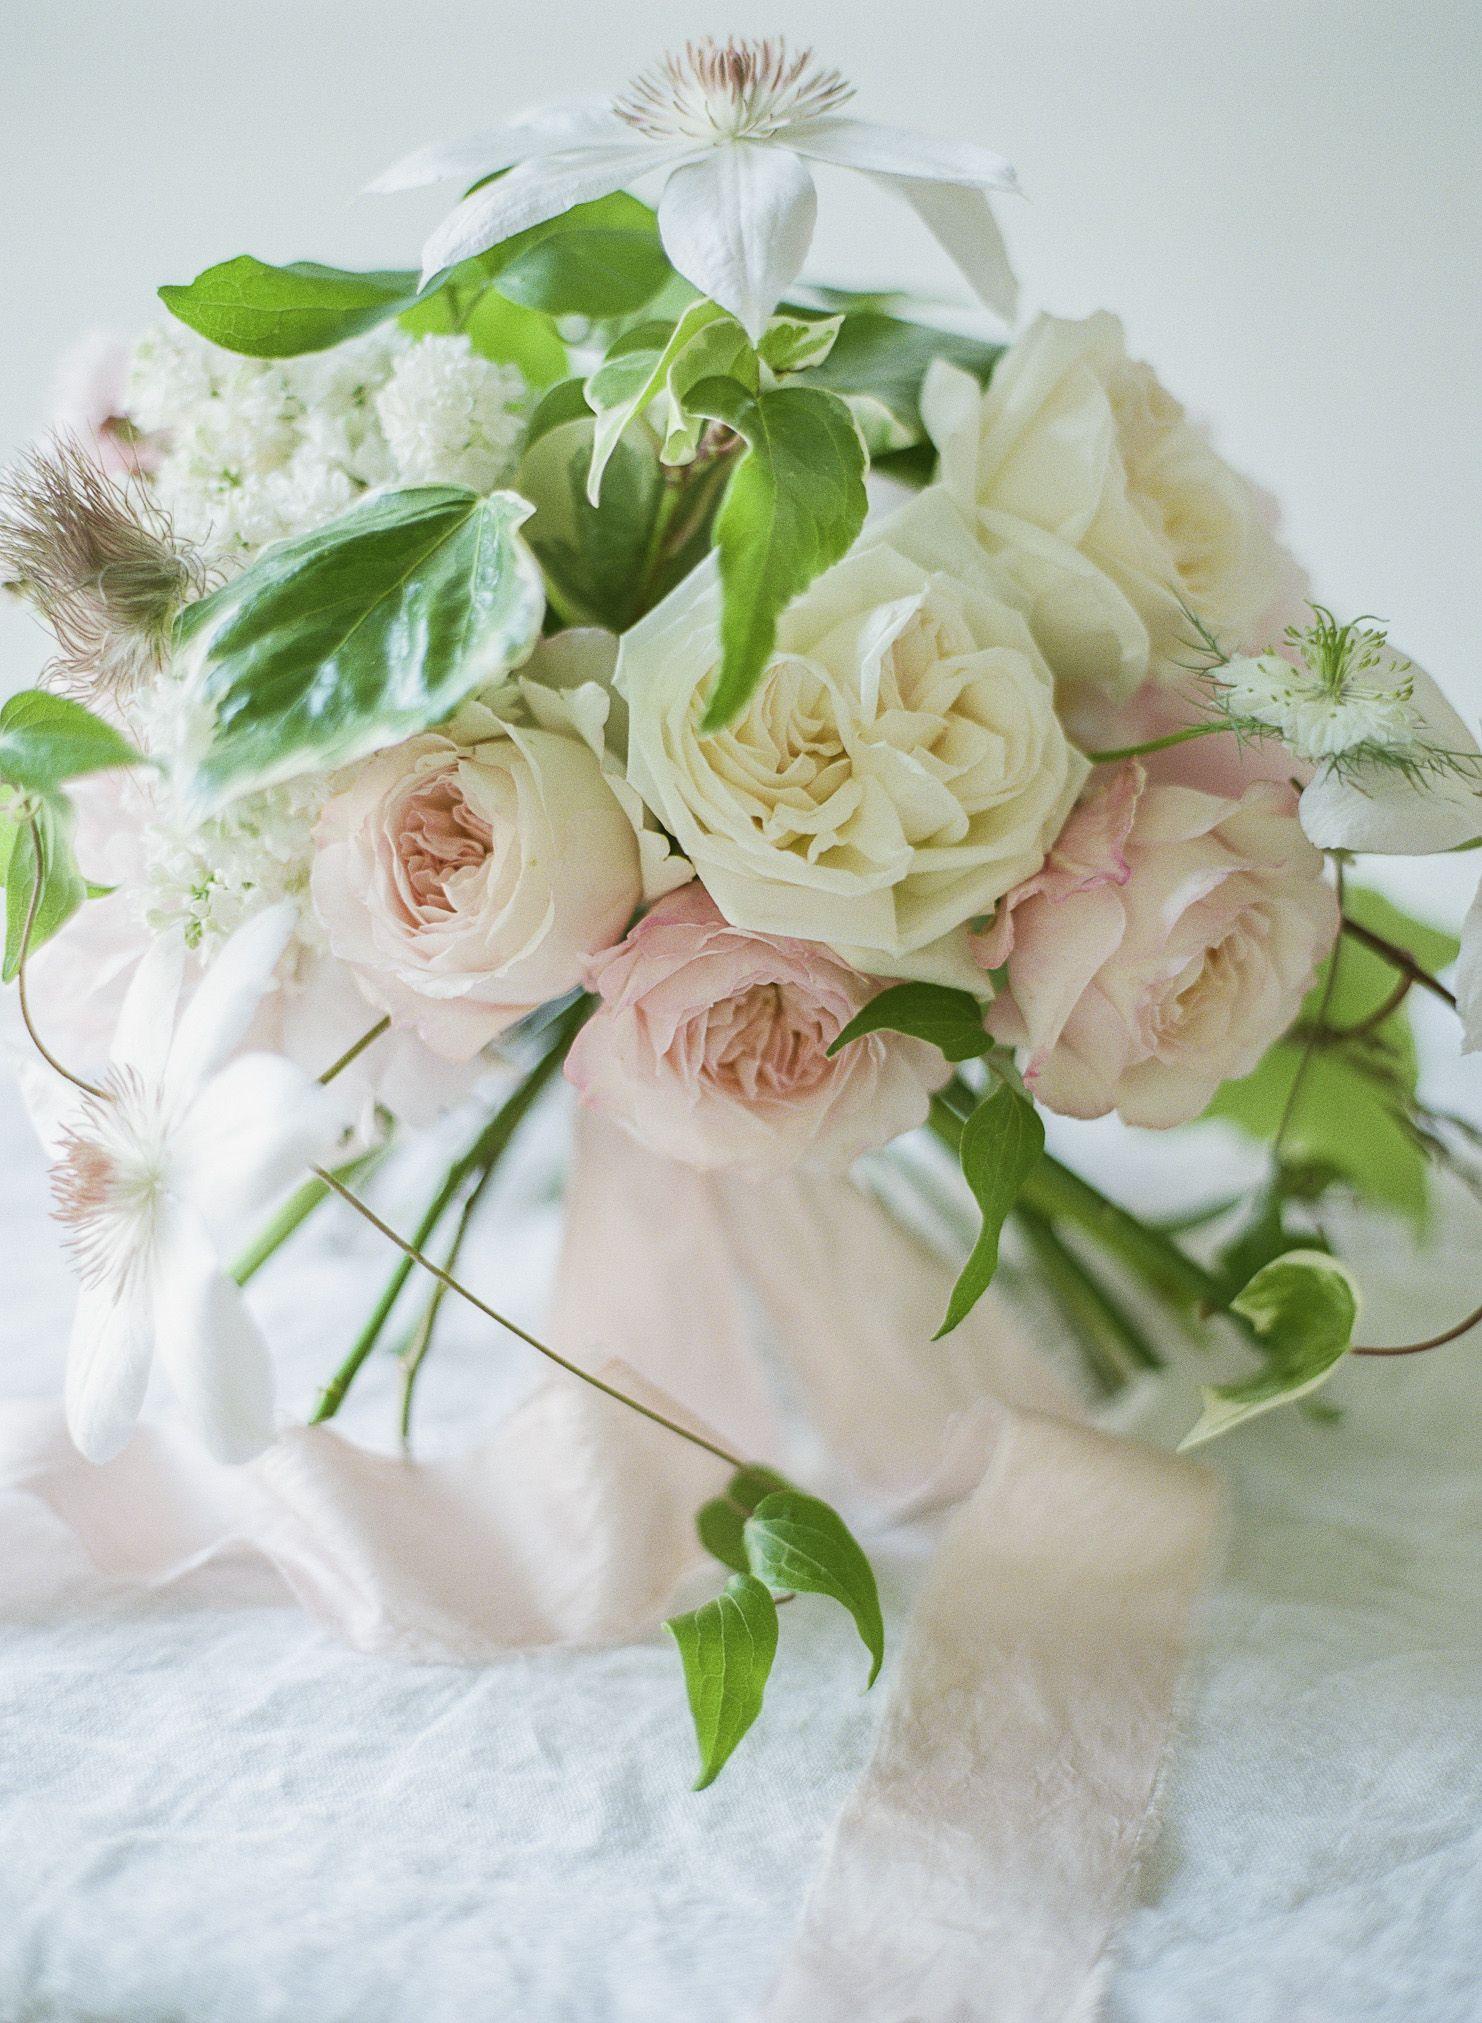 Rosegolden Flowers / bridal bouquet of o'hara and kiera garden roses, lilac, ivy, clematis, pulsatilla, etc.